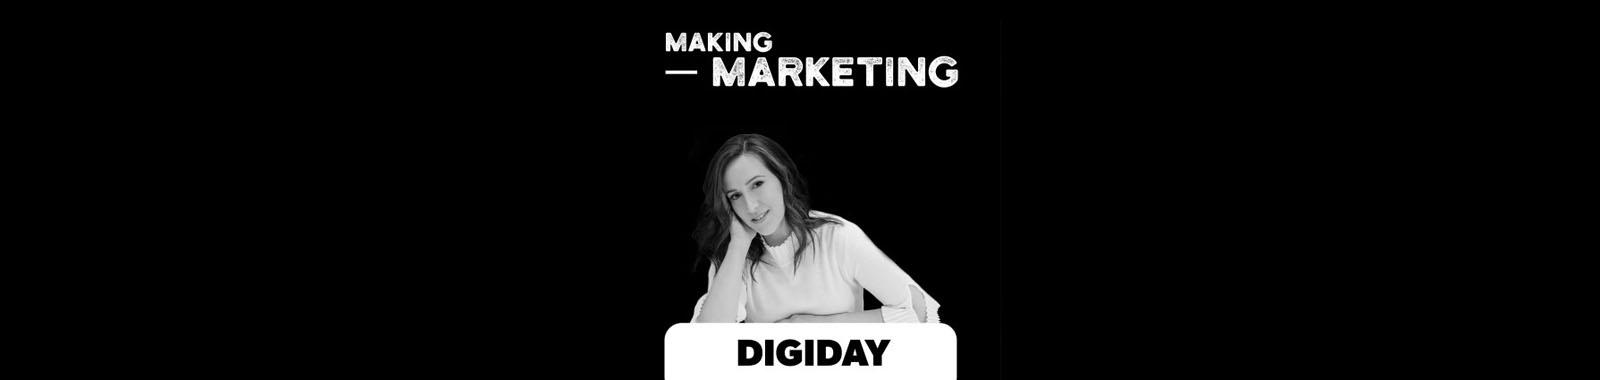 making_marketing_2596x1078_Rachel-Drori-1-eye